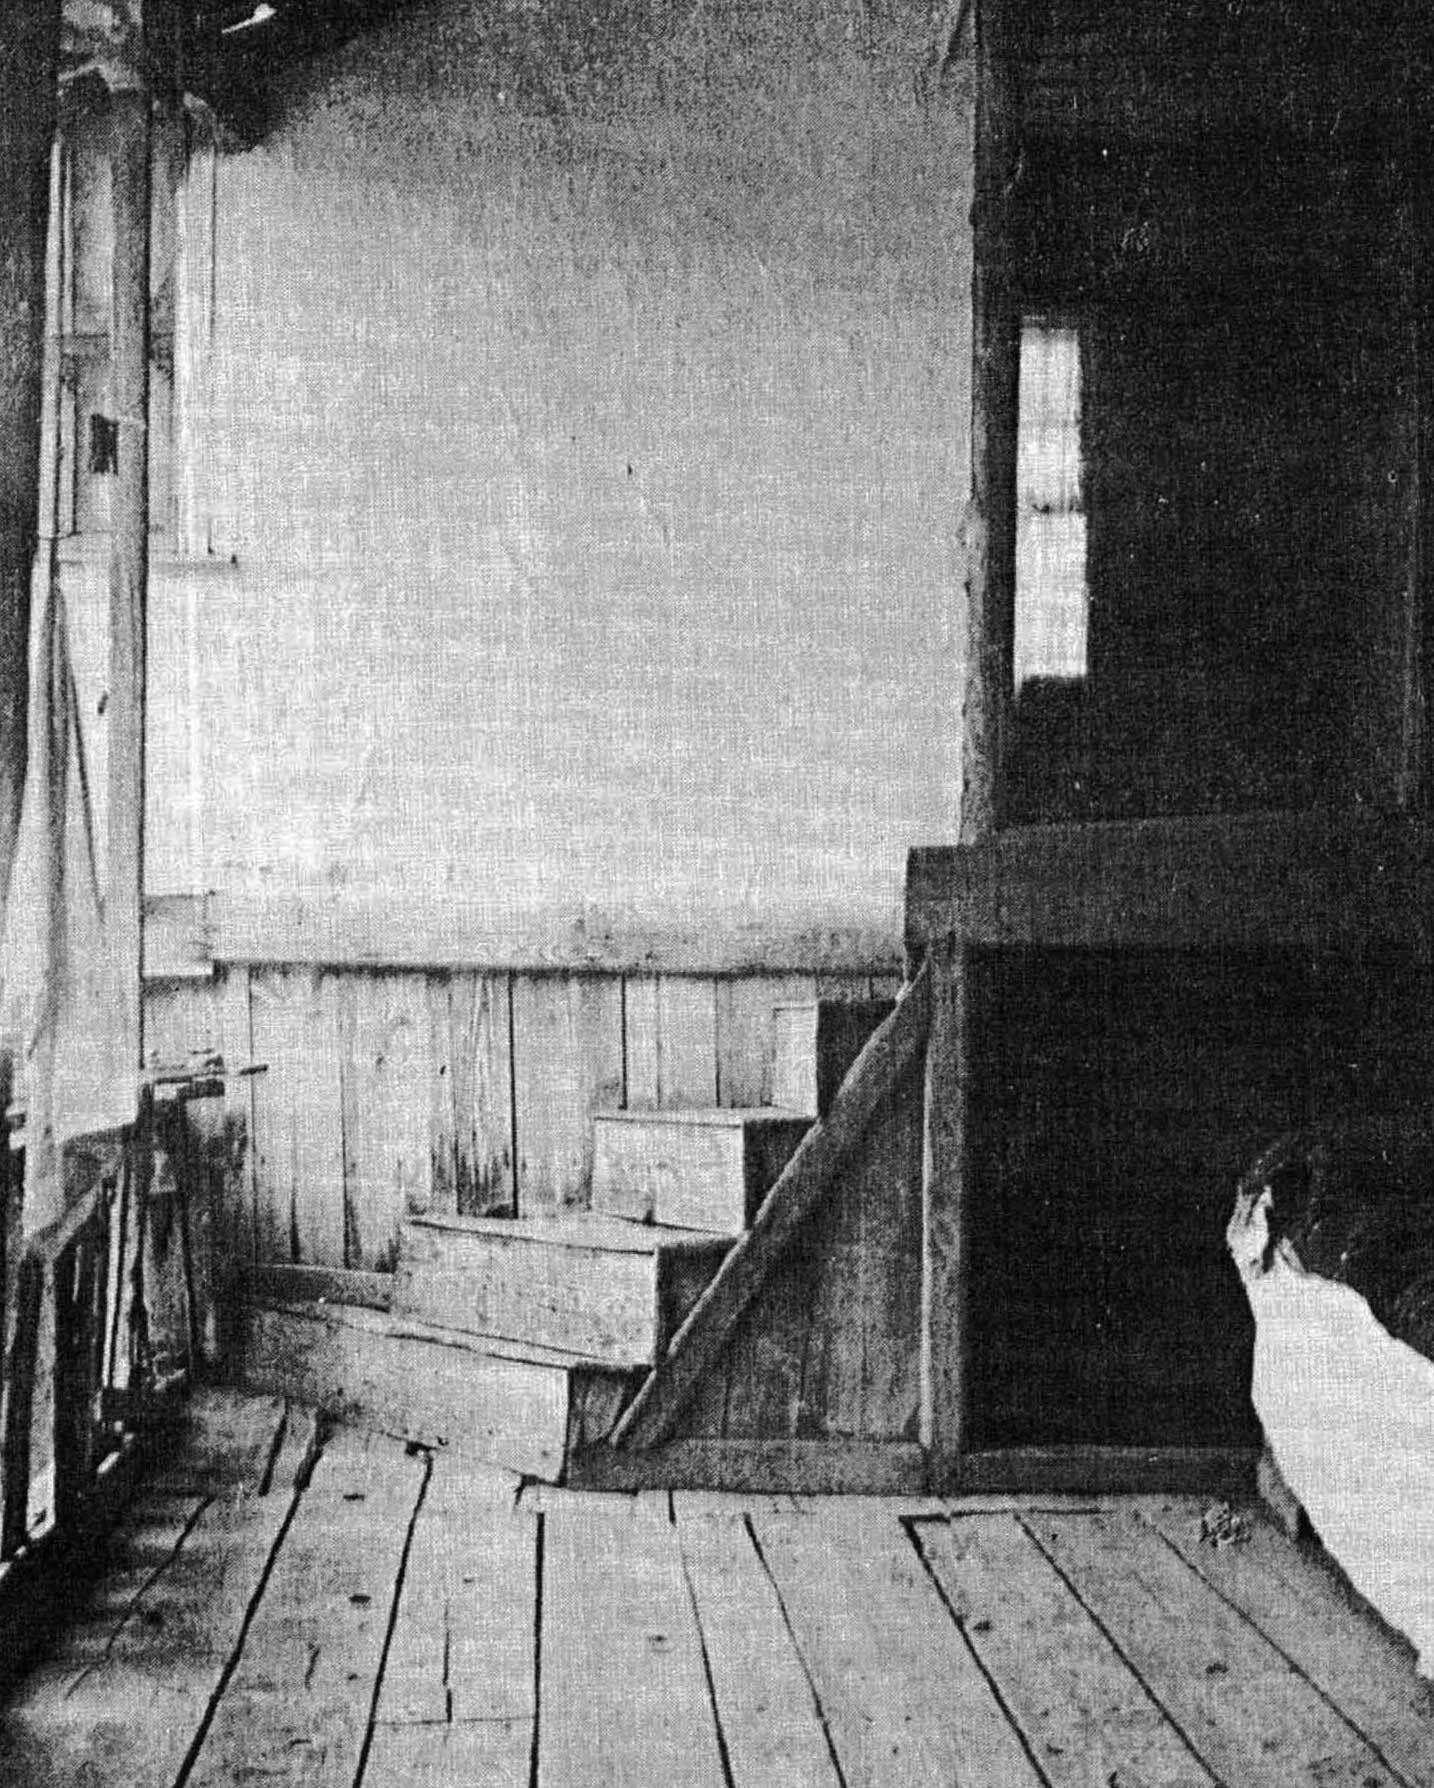 005 Bed In The Corner In Dinarska House Image By F Skerlep 1954